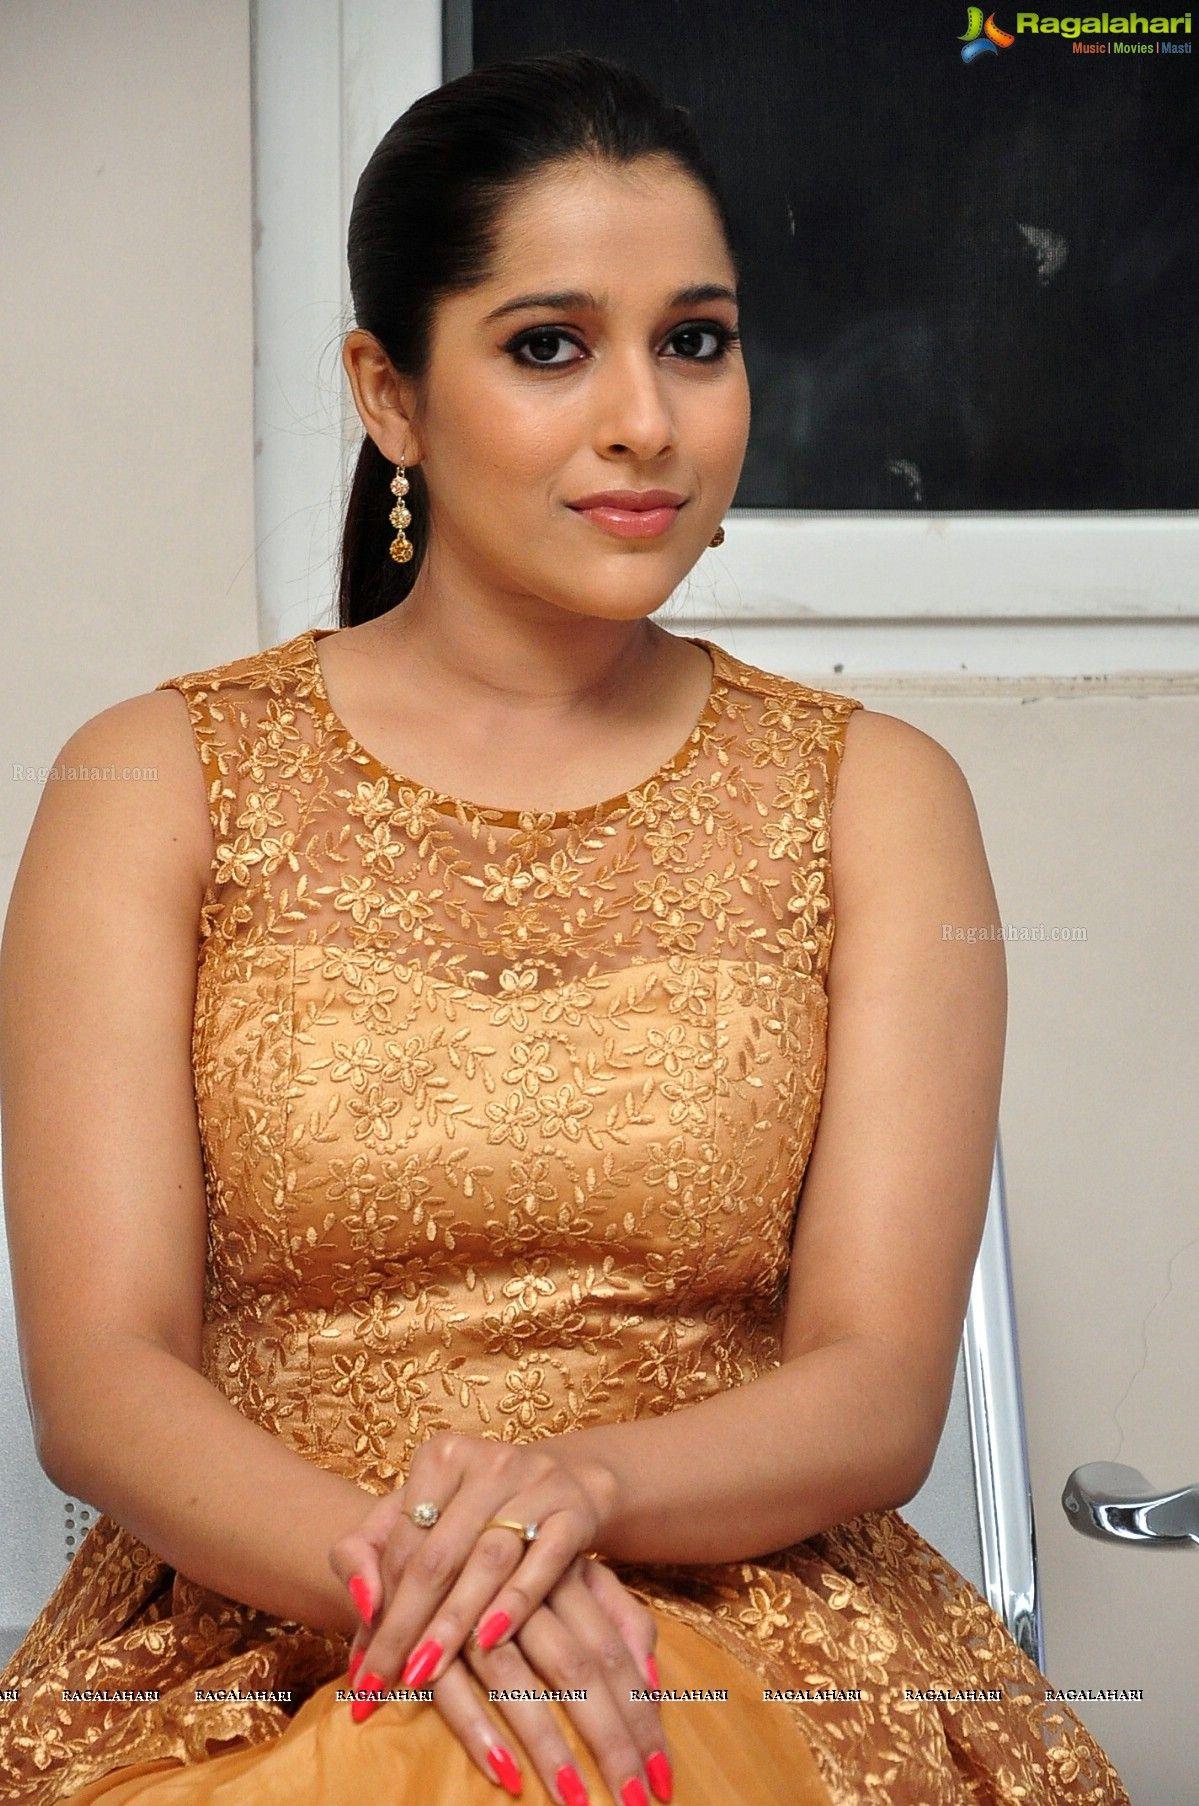 Rashmi Gautam Image 20 Telugu Heroines Wallpapers Images Pics Pictures Photoshoot Wallpapers Golden Dress Bikini Pictures Tank Top Fashion